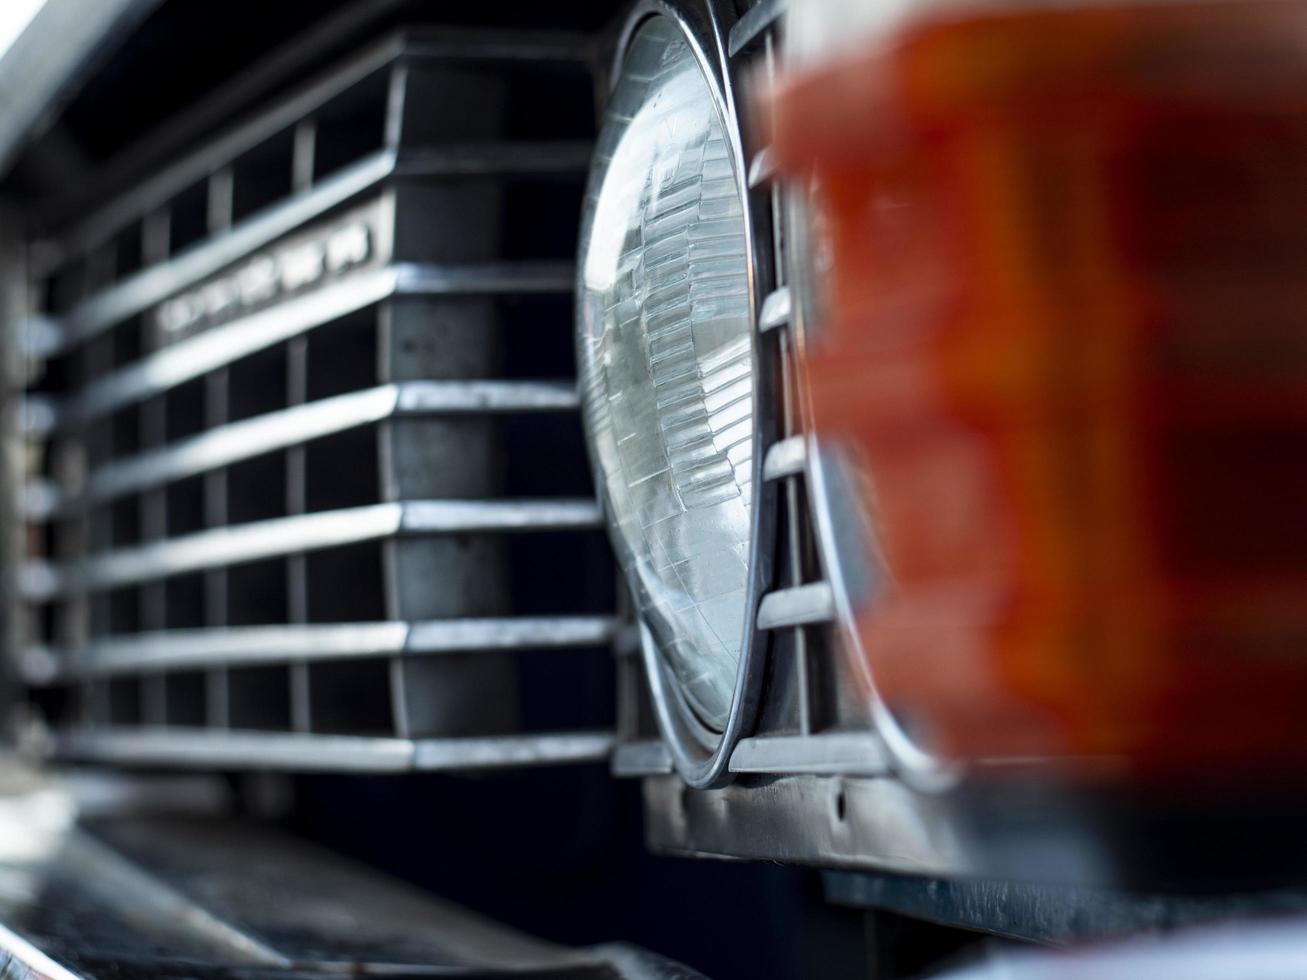 phare et grill une vieille belle voiture photo